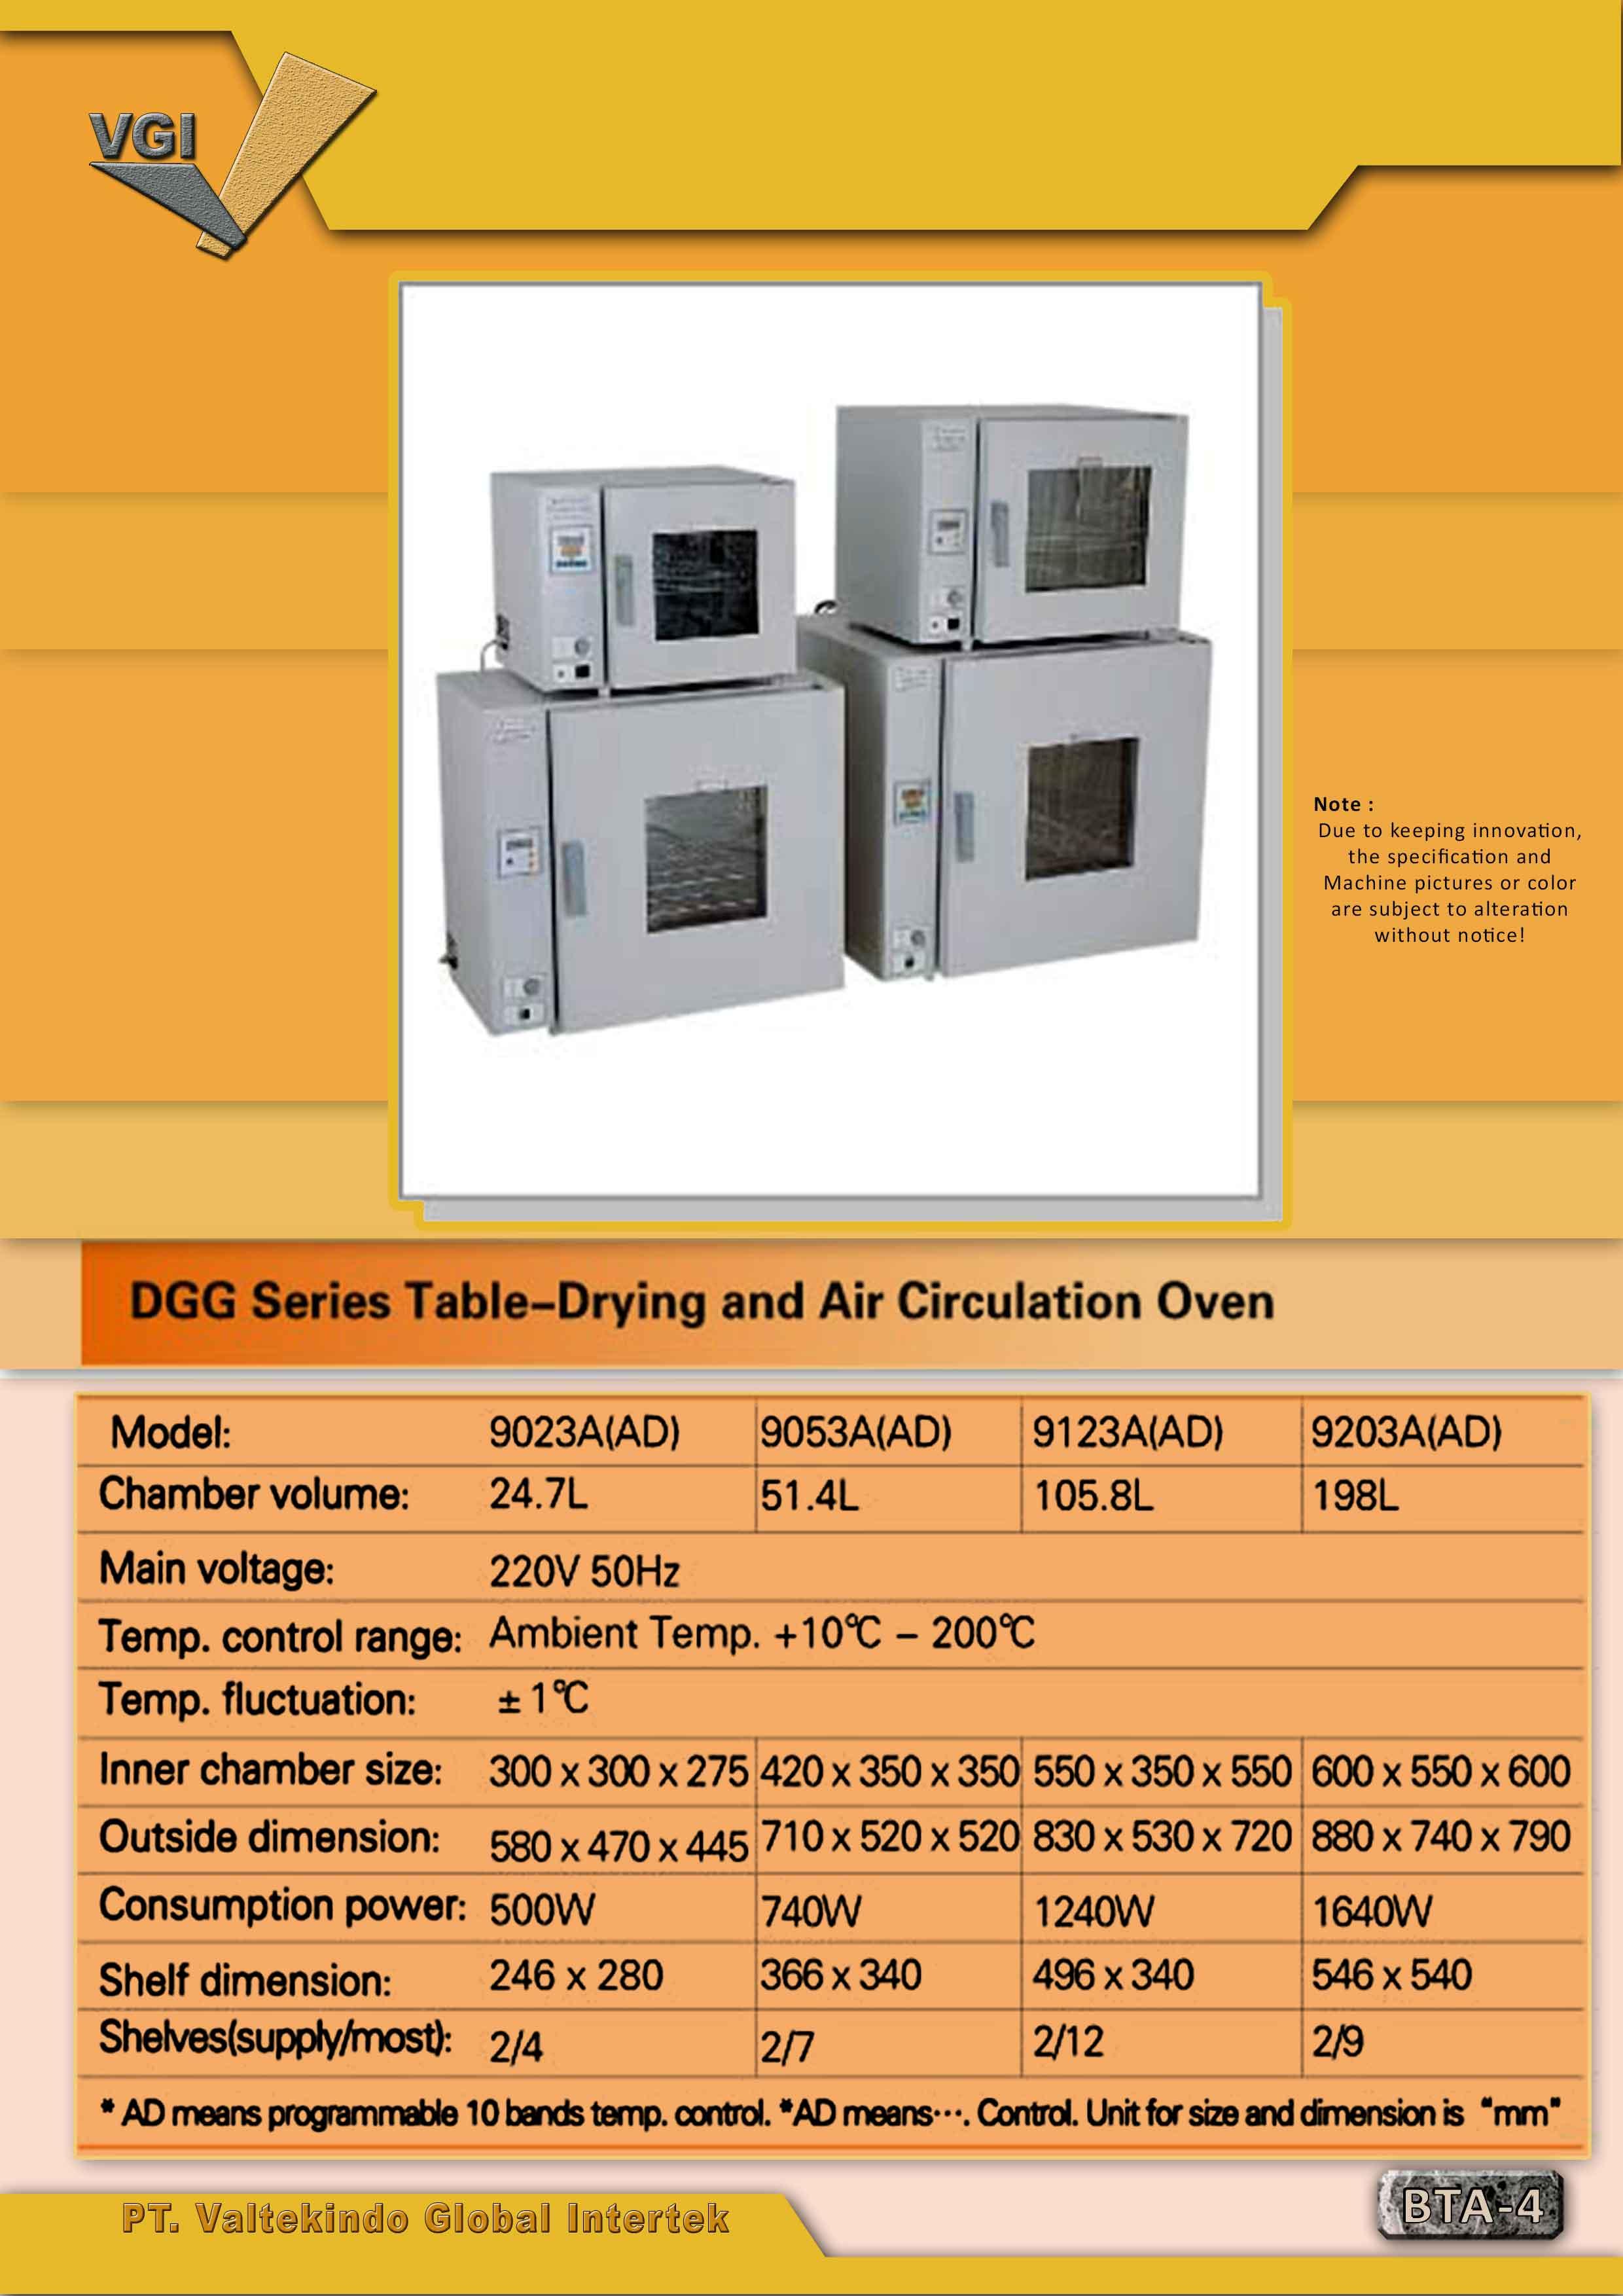 jual mesin Table Drying and Air Circulation Oven Table Drying and Air Circulation Oven